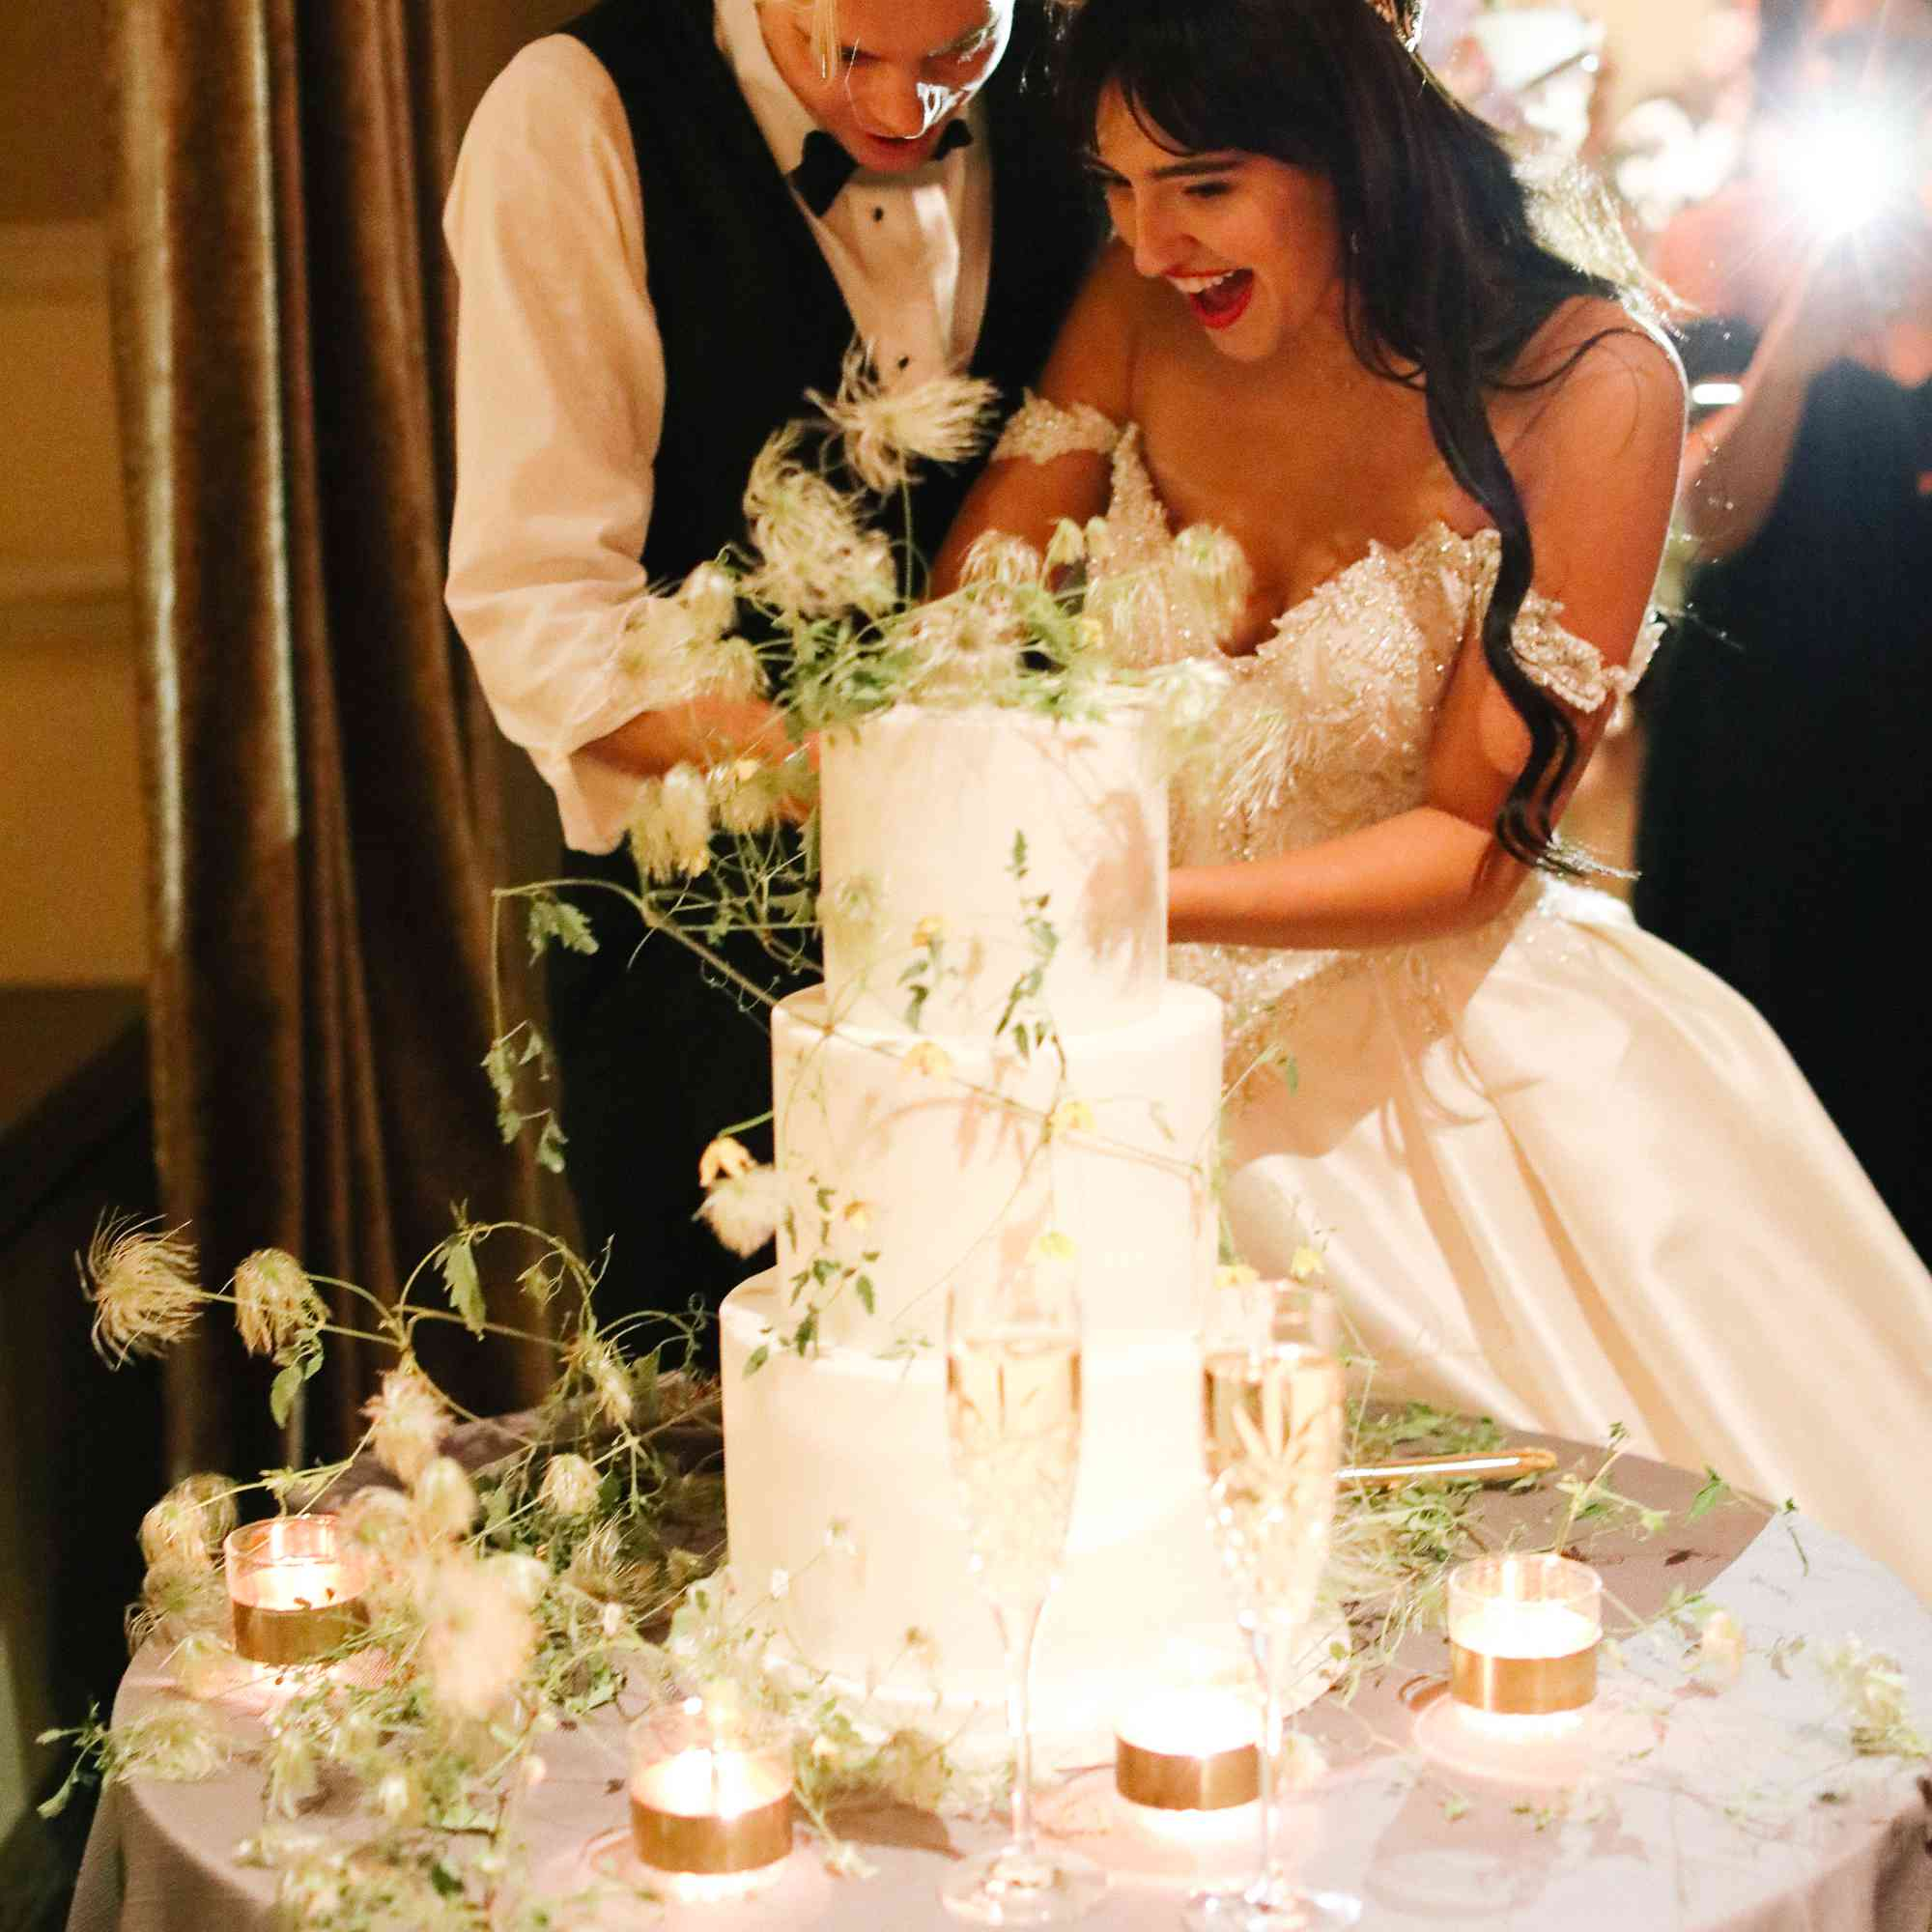 savannah and riker wedding, cake cutting